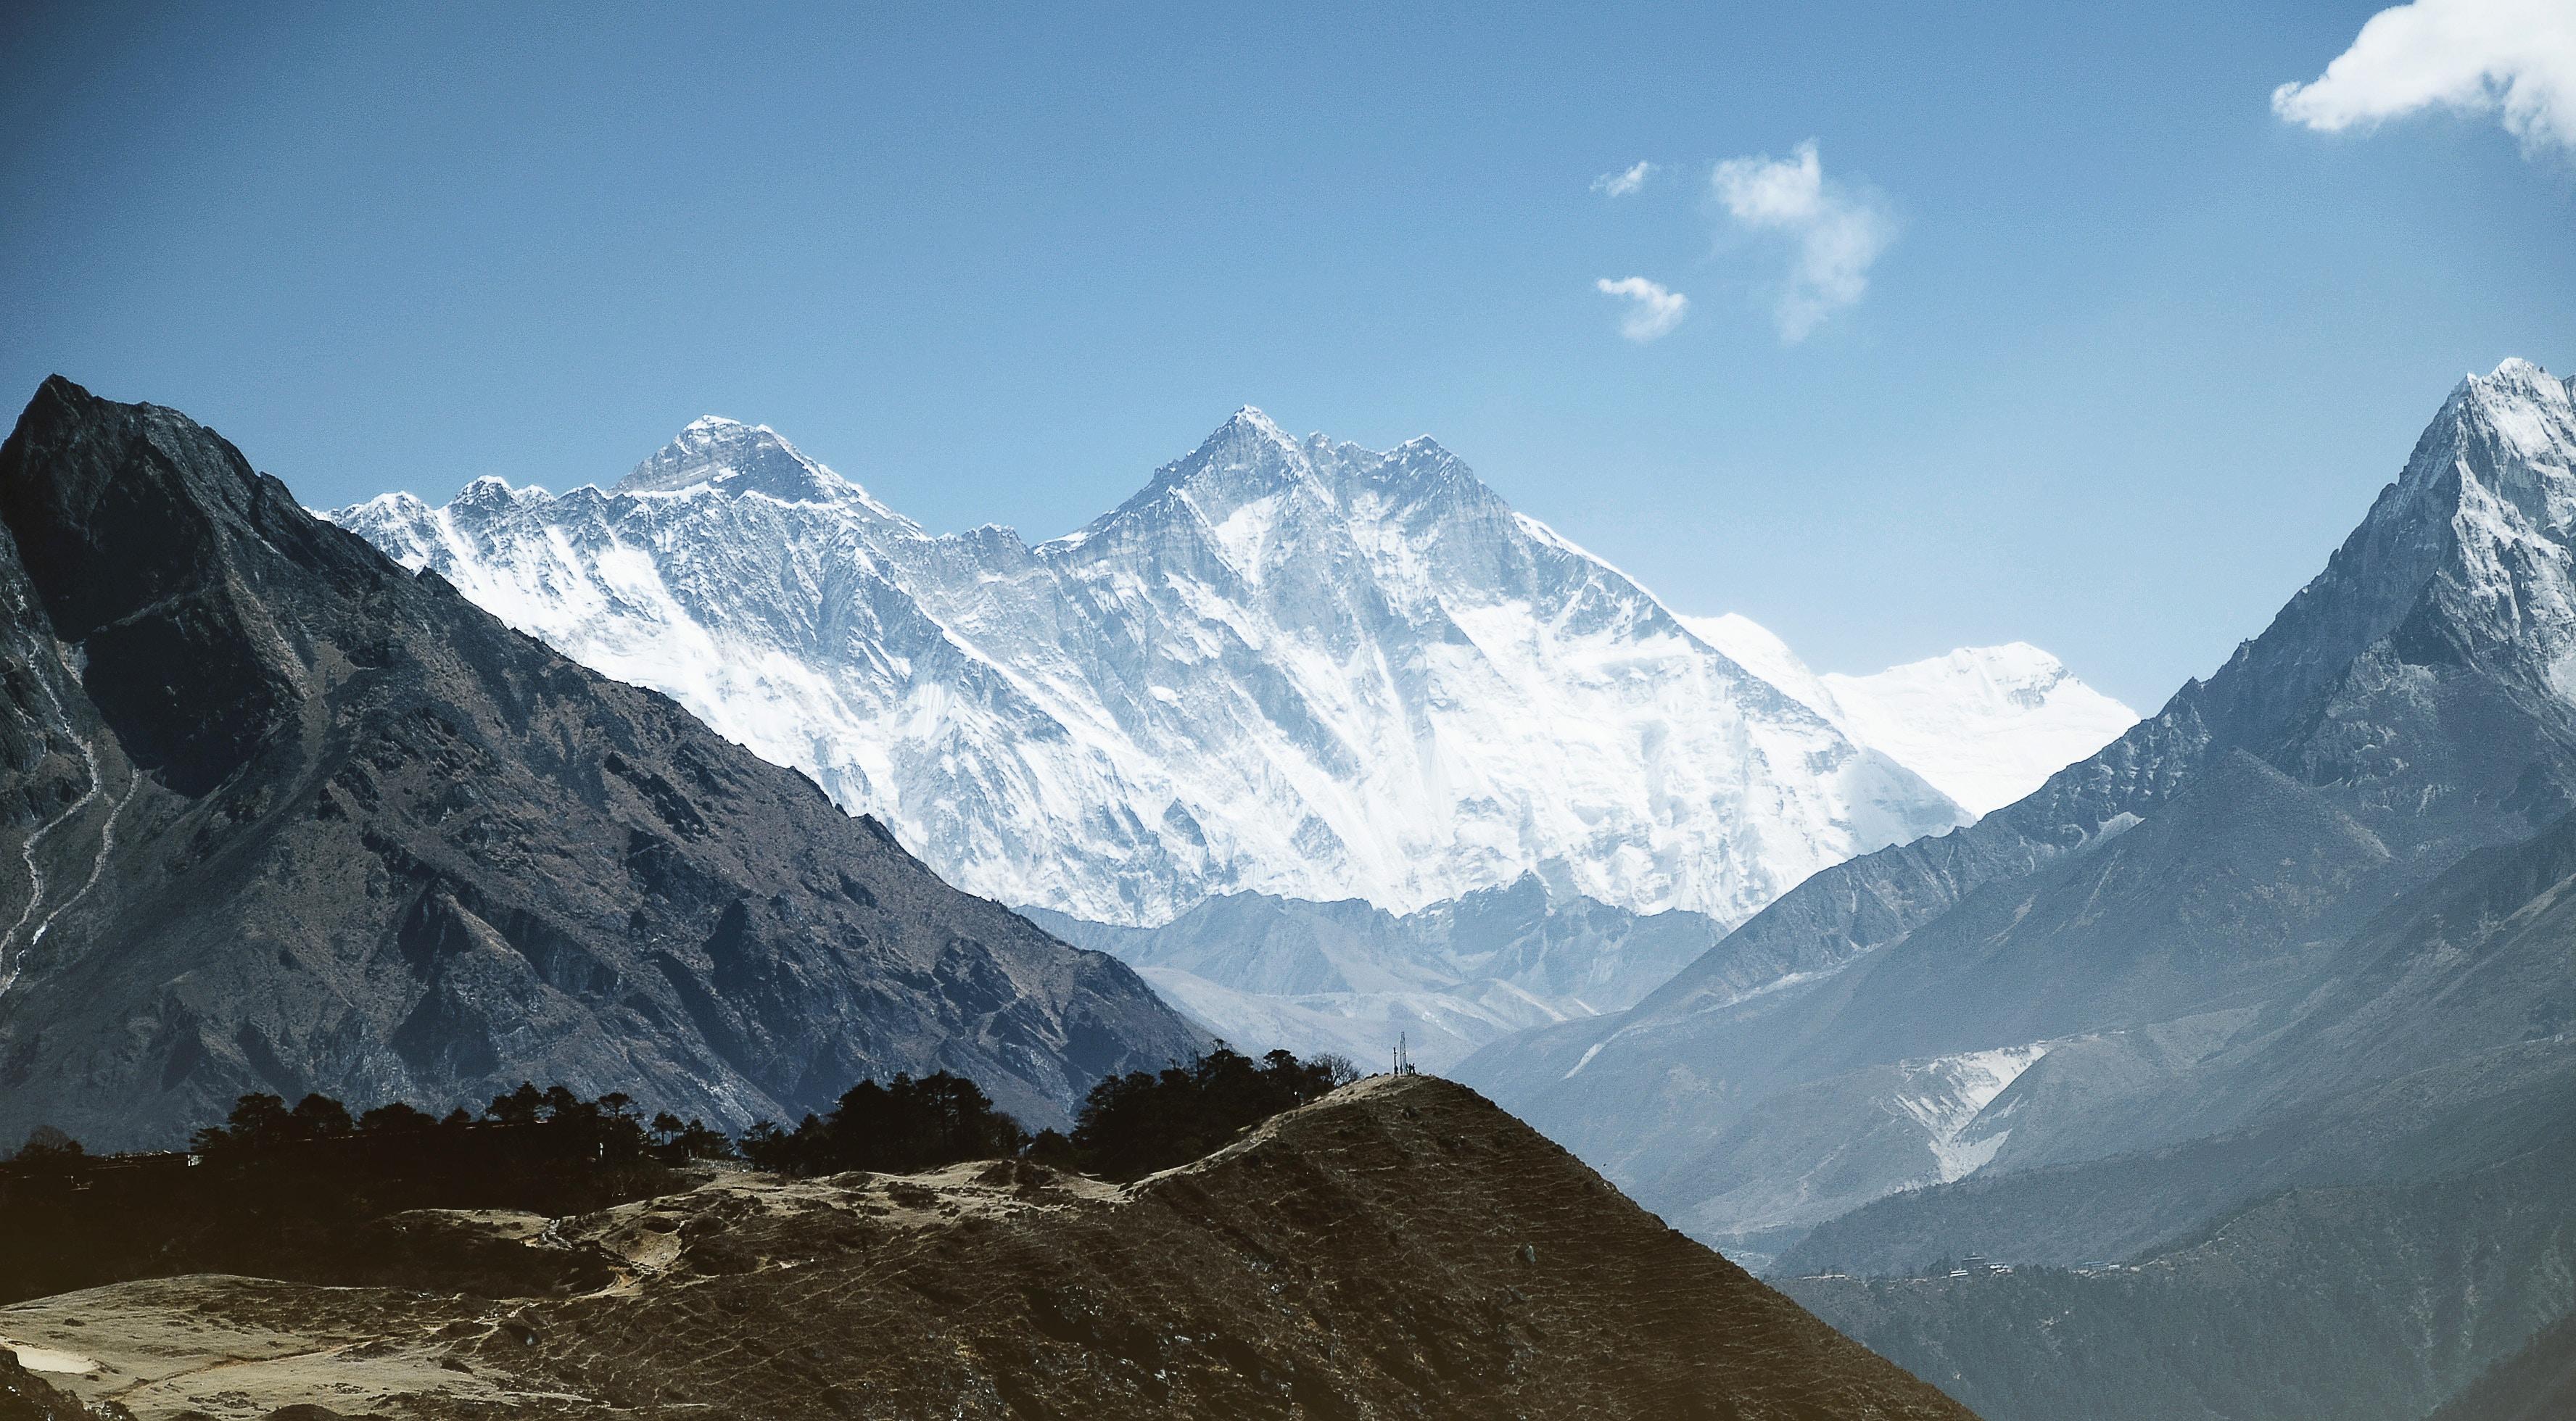 Nepali Christians traversing mountains to share the Gospel